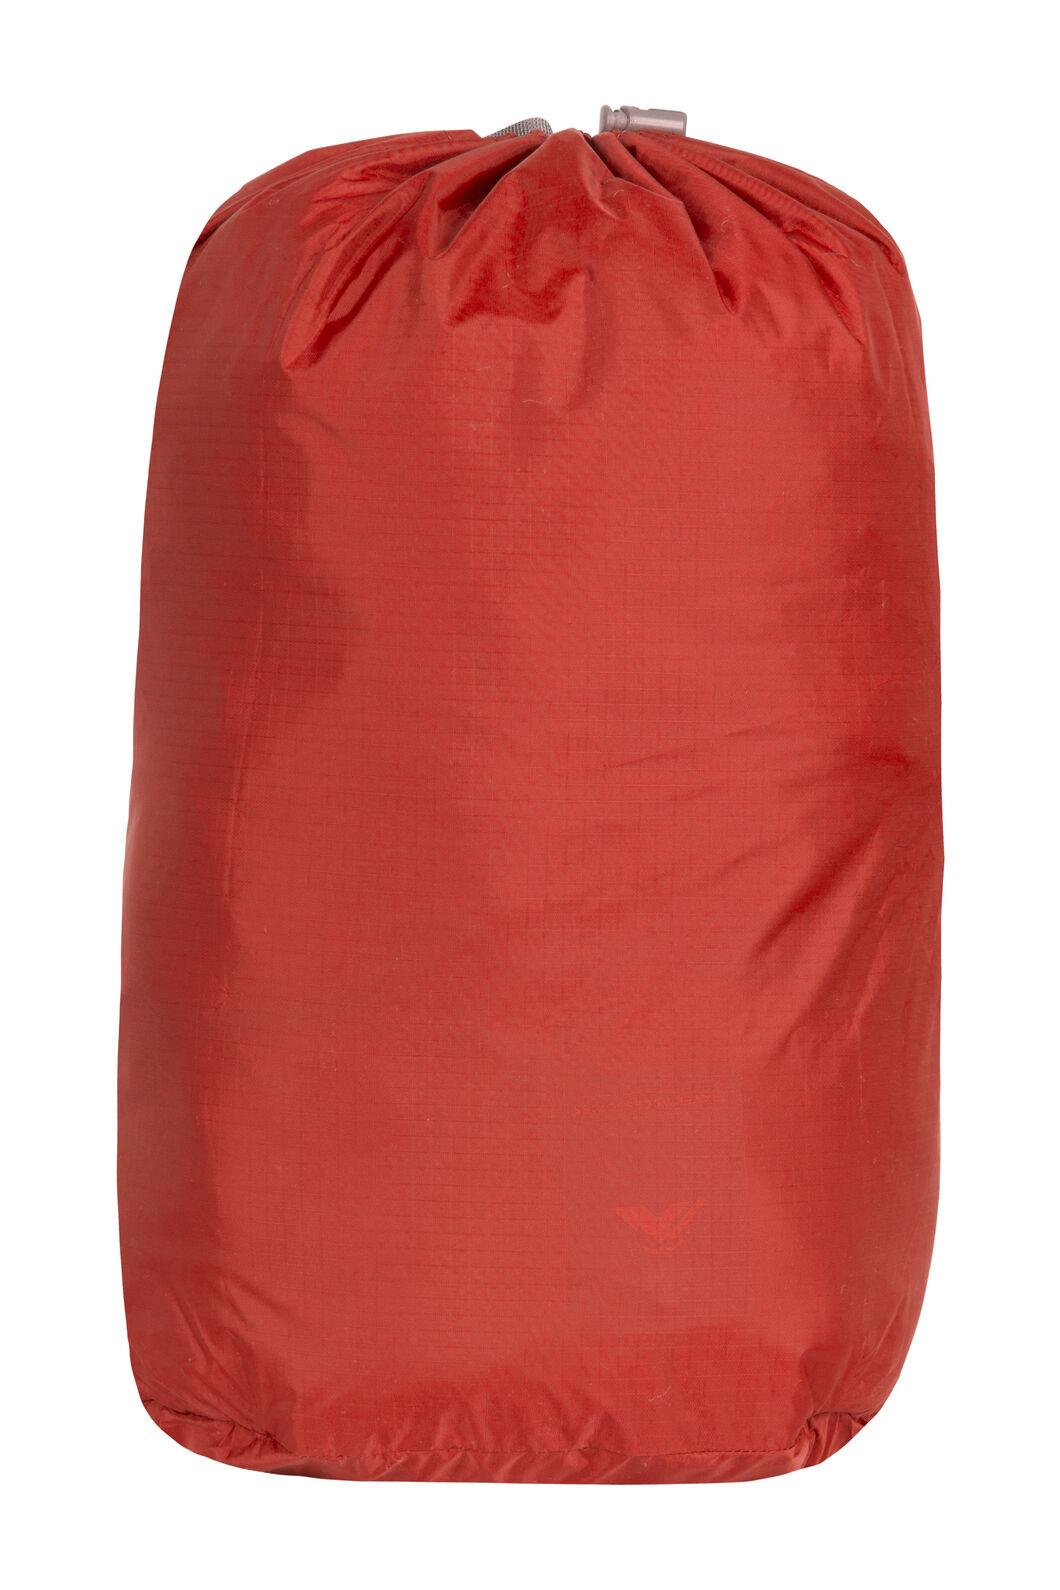 Macpac Stuff Sack XL, Jester Red, hi-res